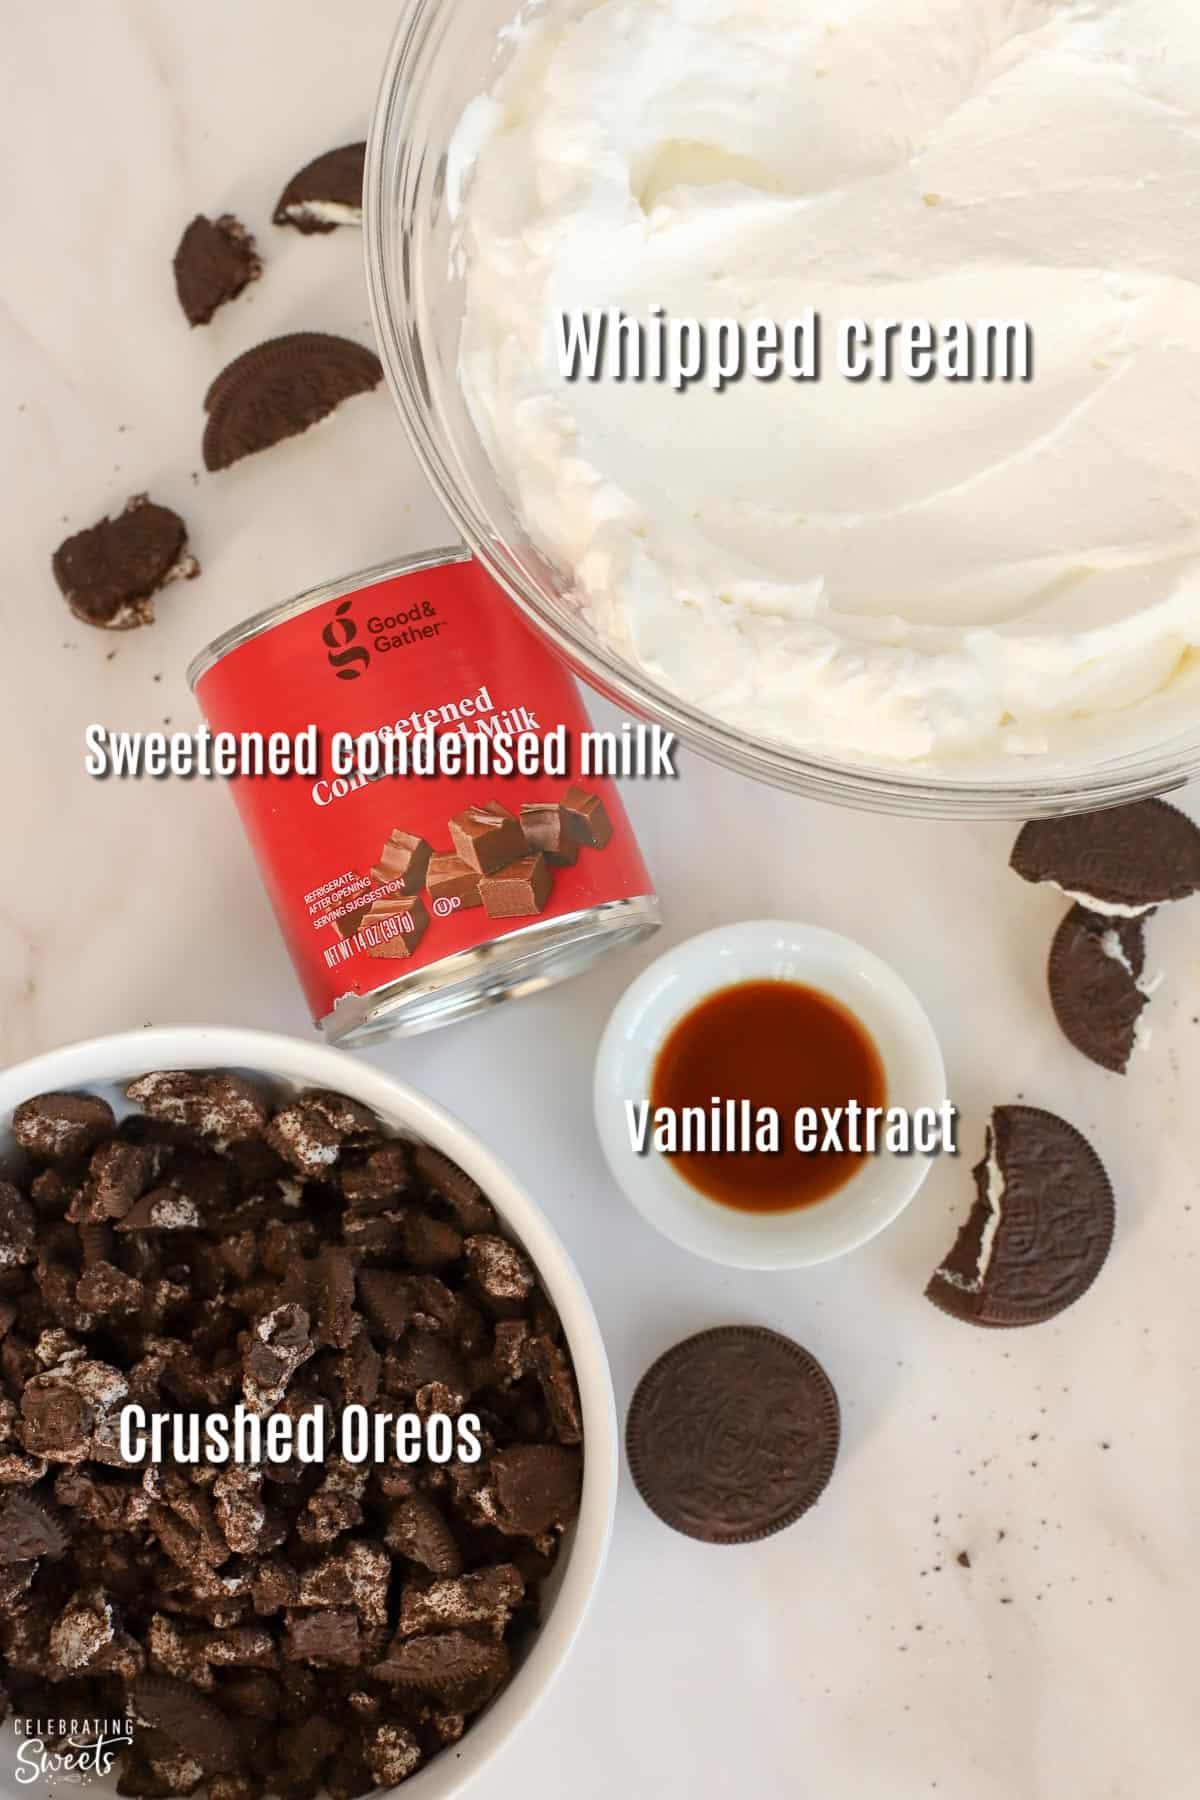 Ingredients for cookies and cream ice cream: whipped cream, sweetened condensed milk, oreos.